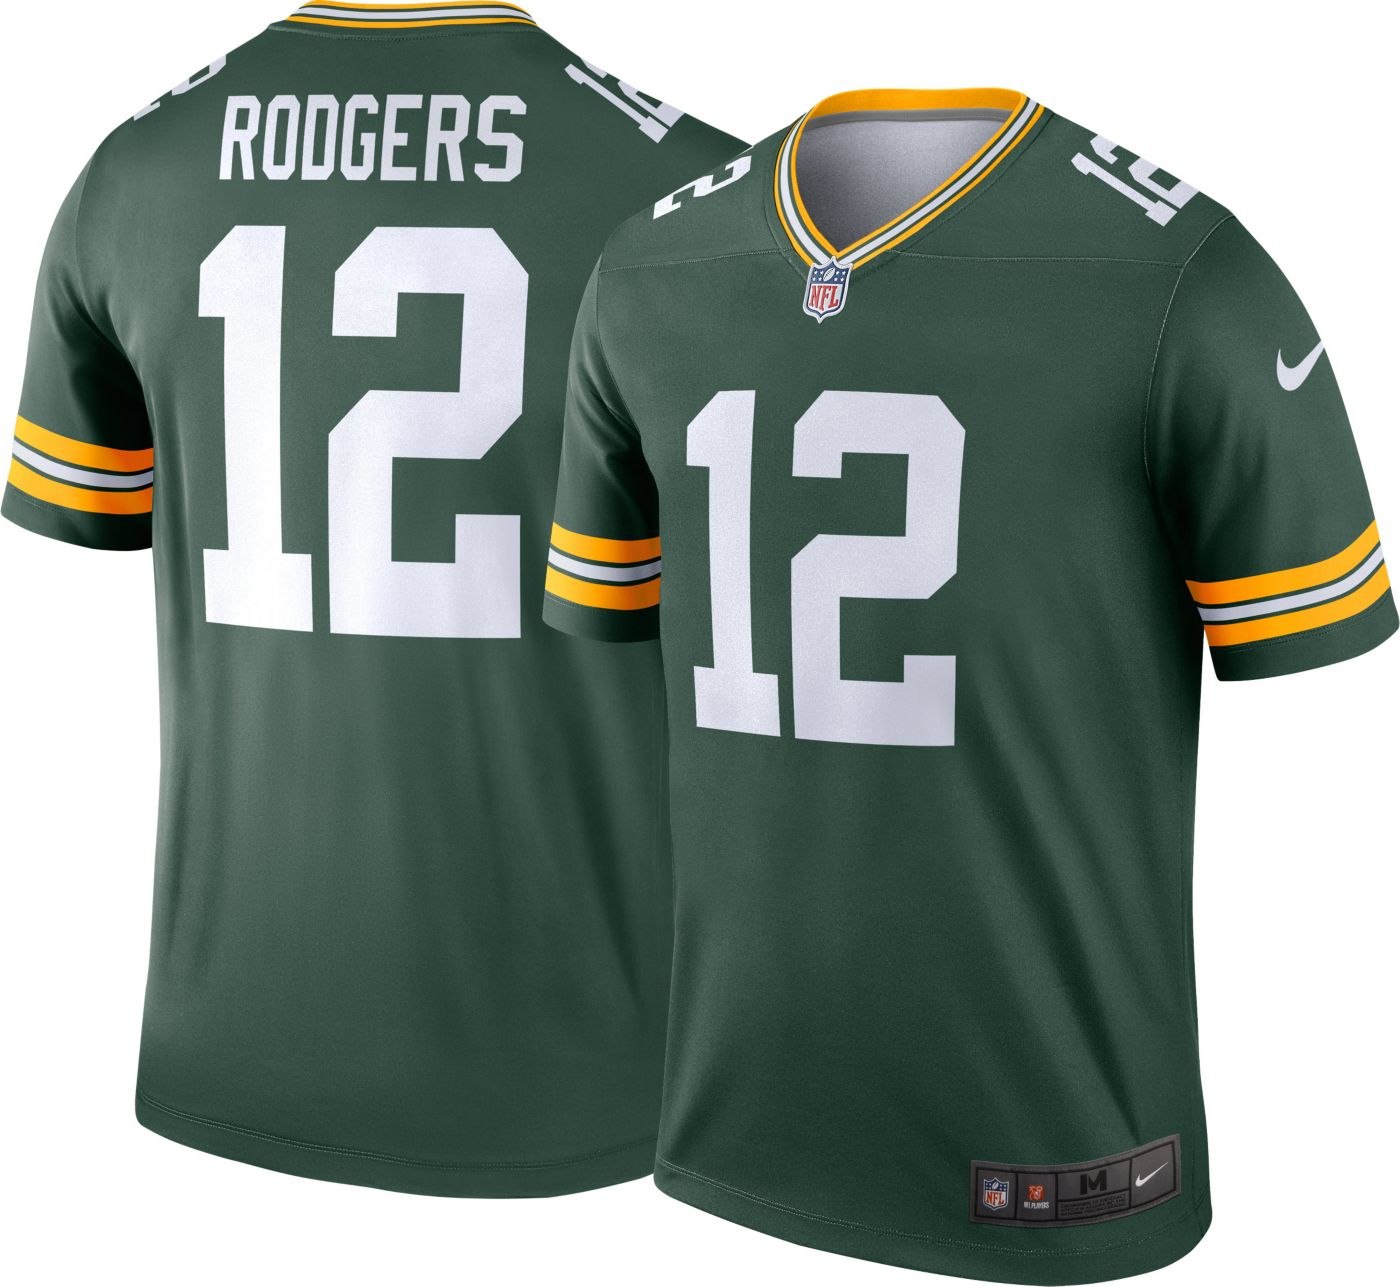 Nike Men's Home Legend Jersey Green Bay Packers Aaron Rodgers #12